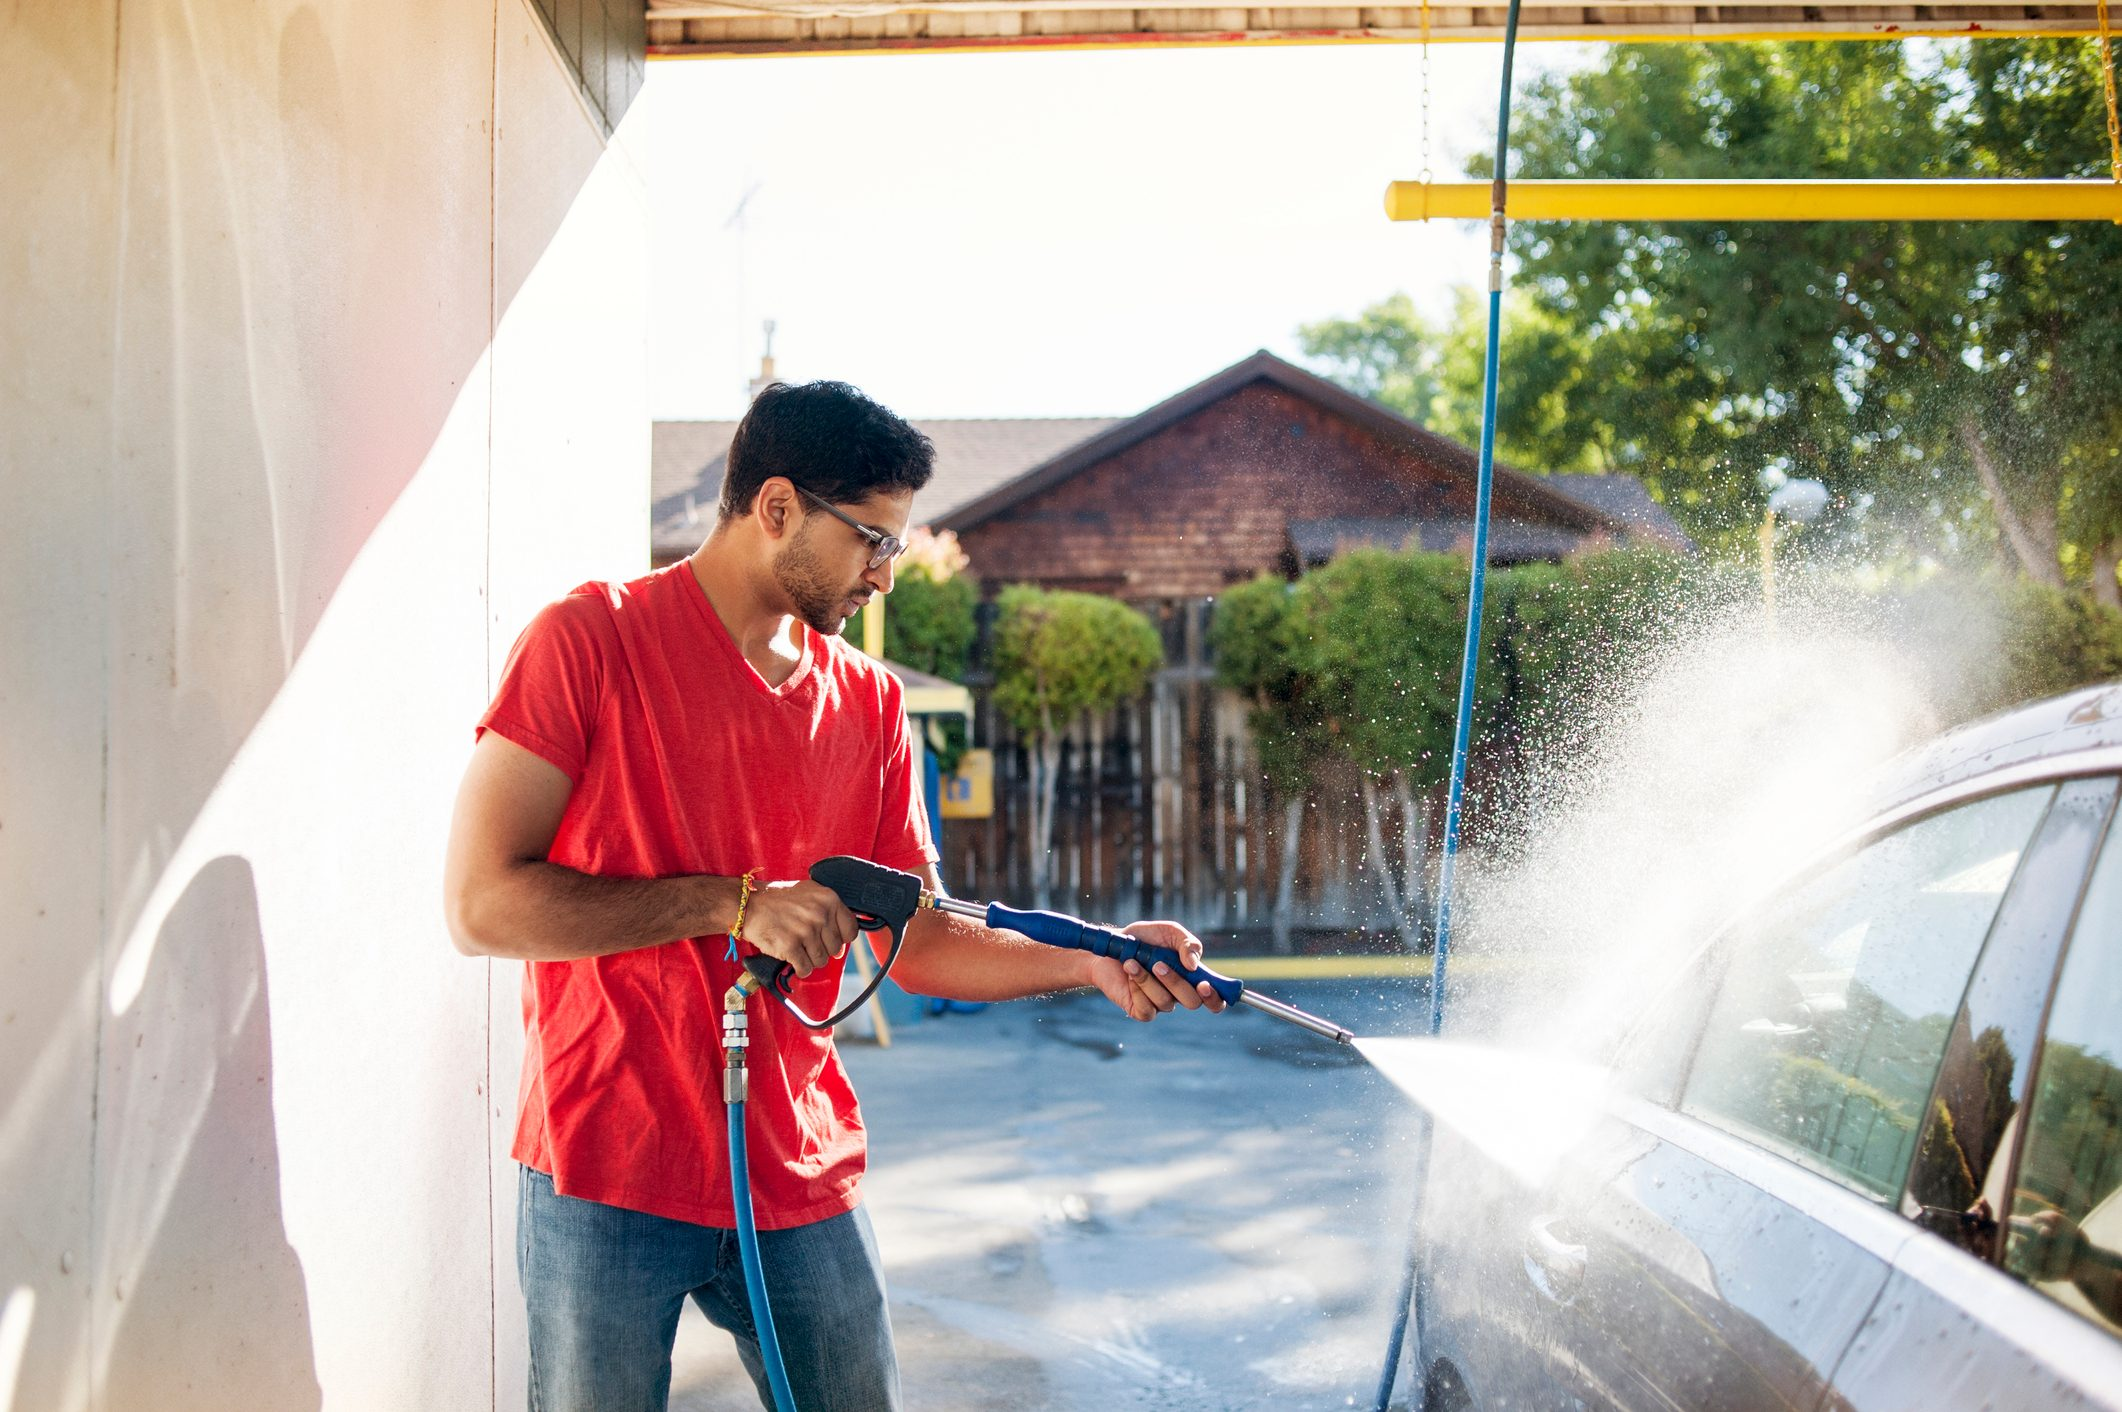 Man washing car in garage on sunny day